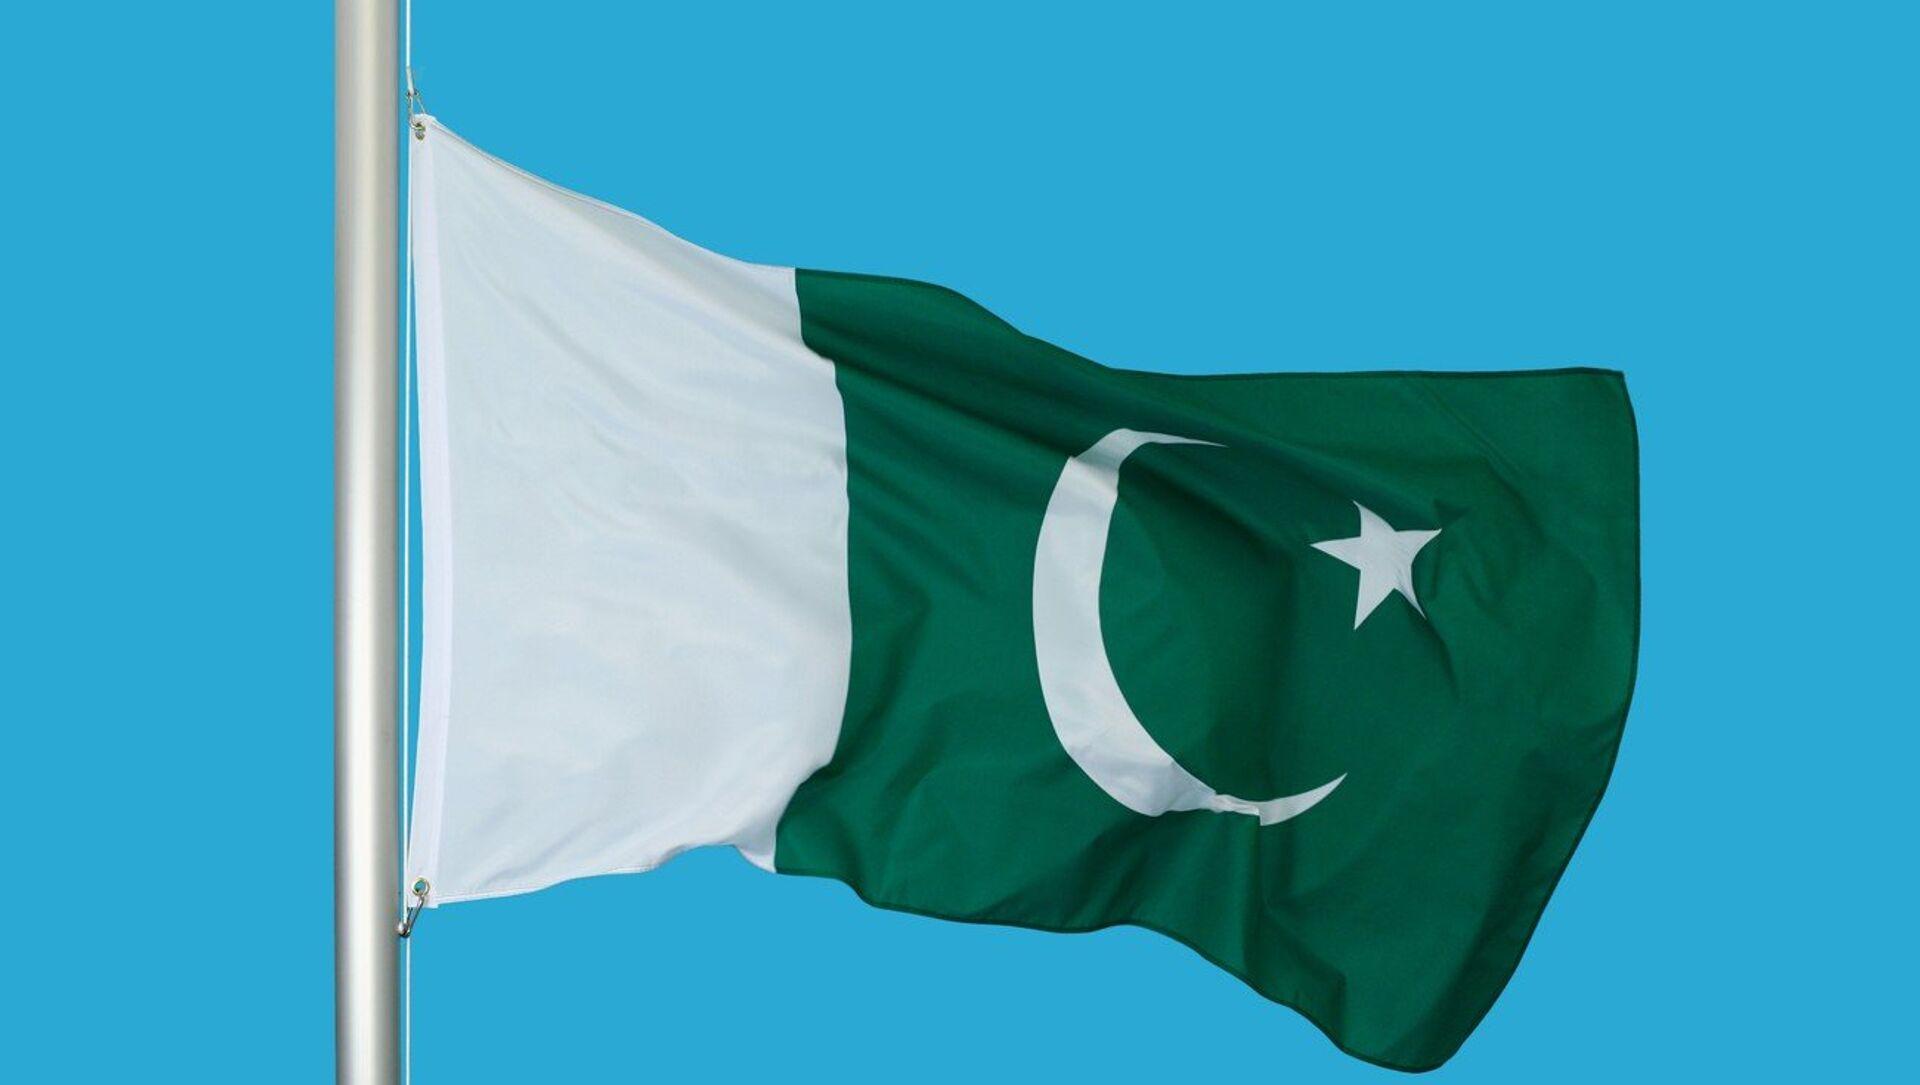 Flag of the Islamic Republic of Pakistan - Sputnik International, 1920, 27.07.2021